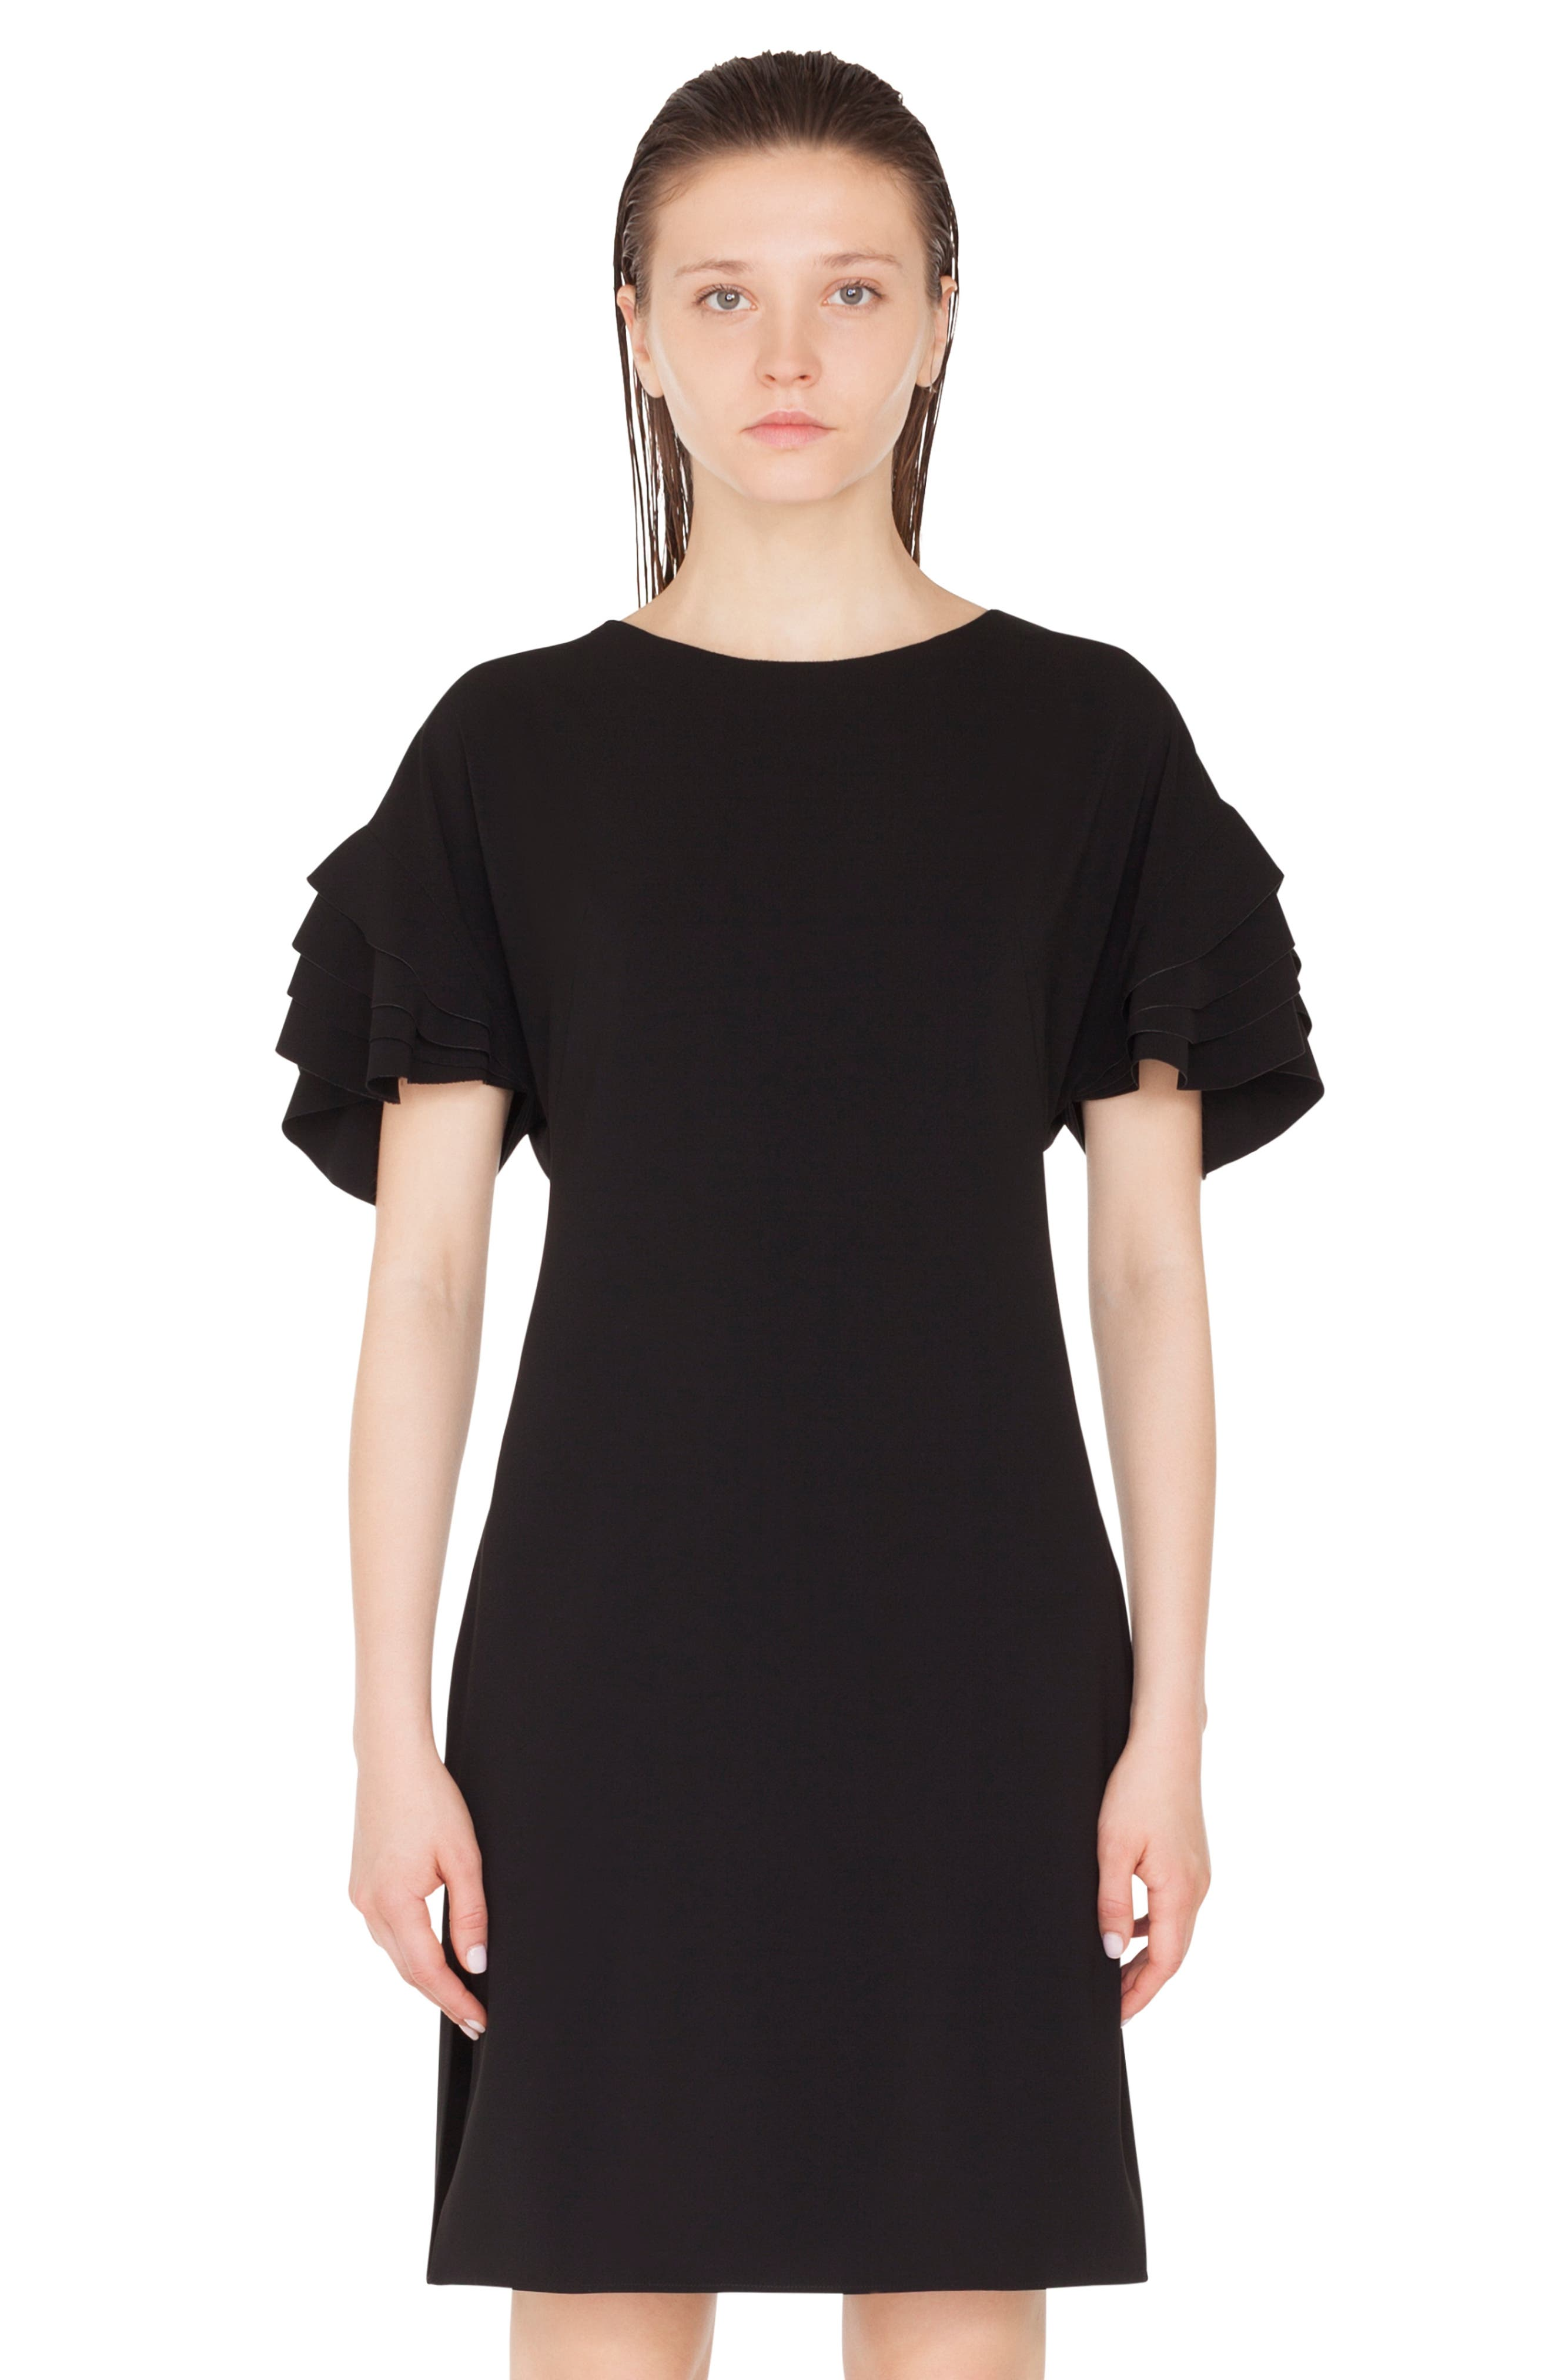 AKRIS PUNTO,                             Layered Sleeve Dress,                             Alternate thumbnail 3, color,                             NERO